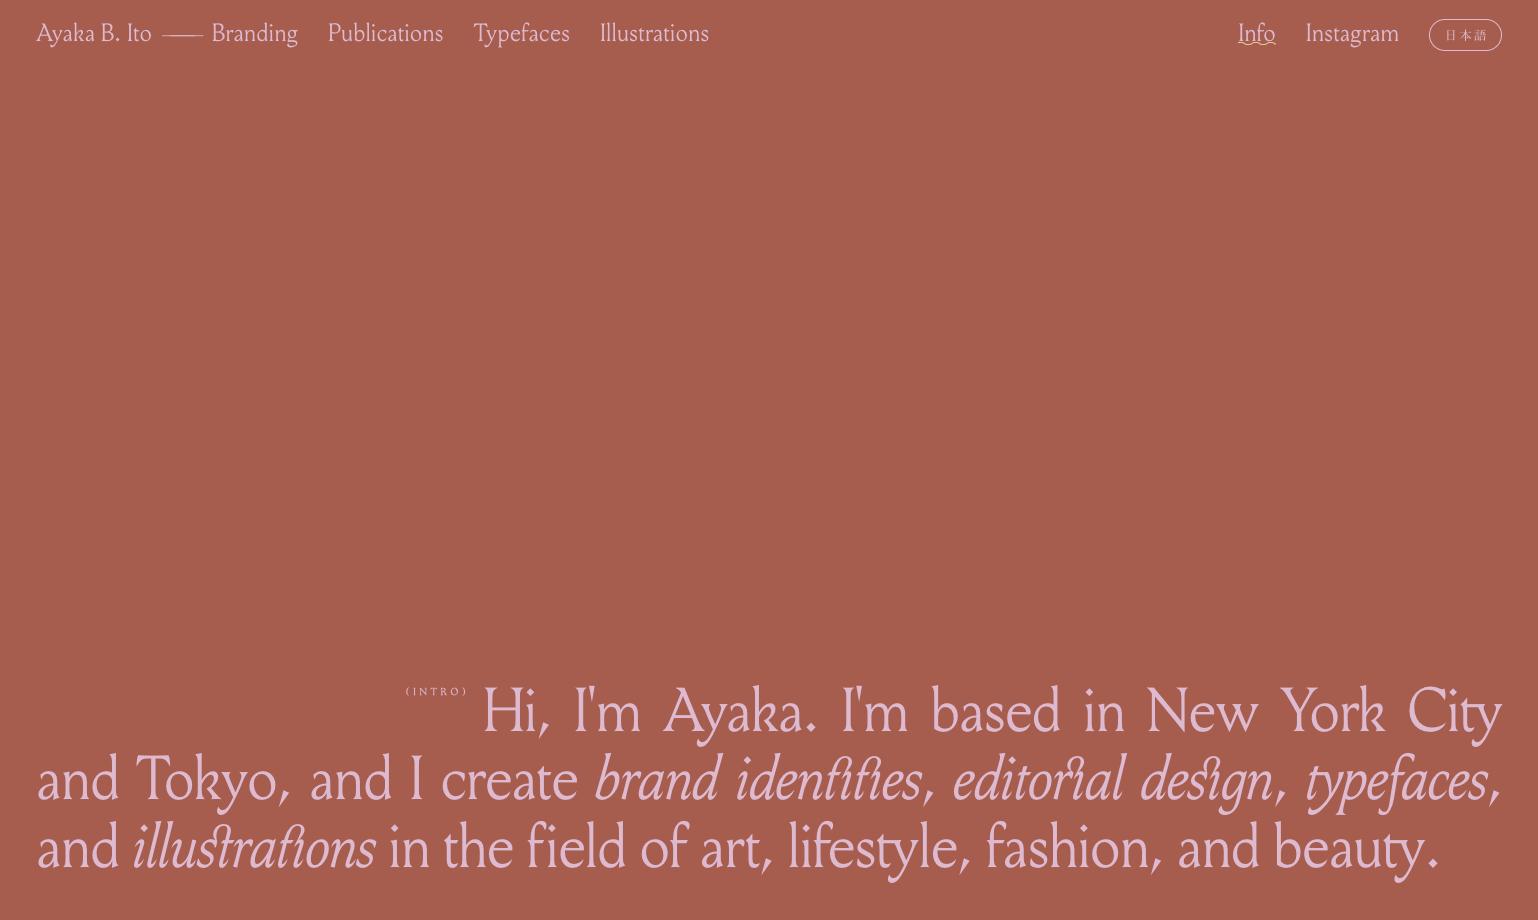 Ayaka Ito's portfolio website